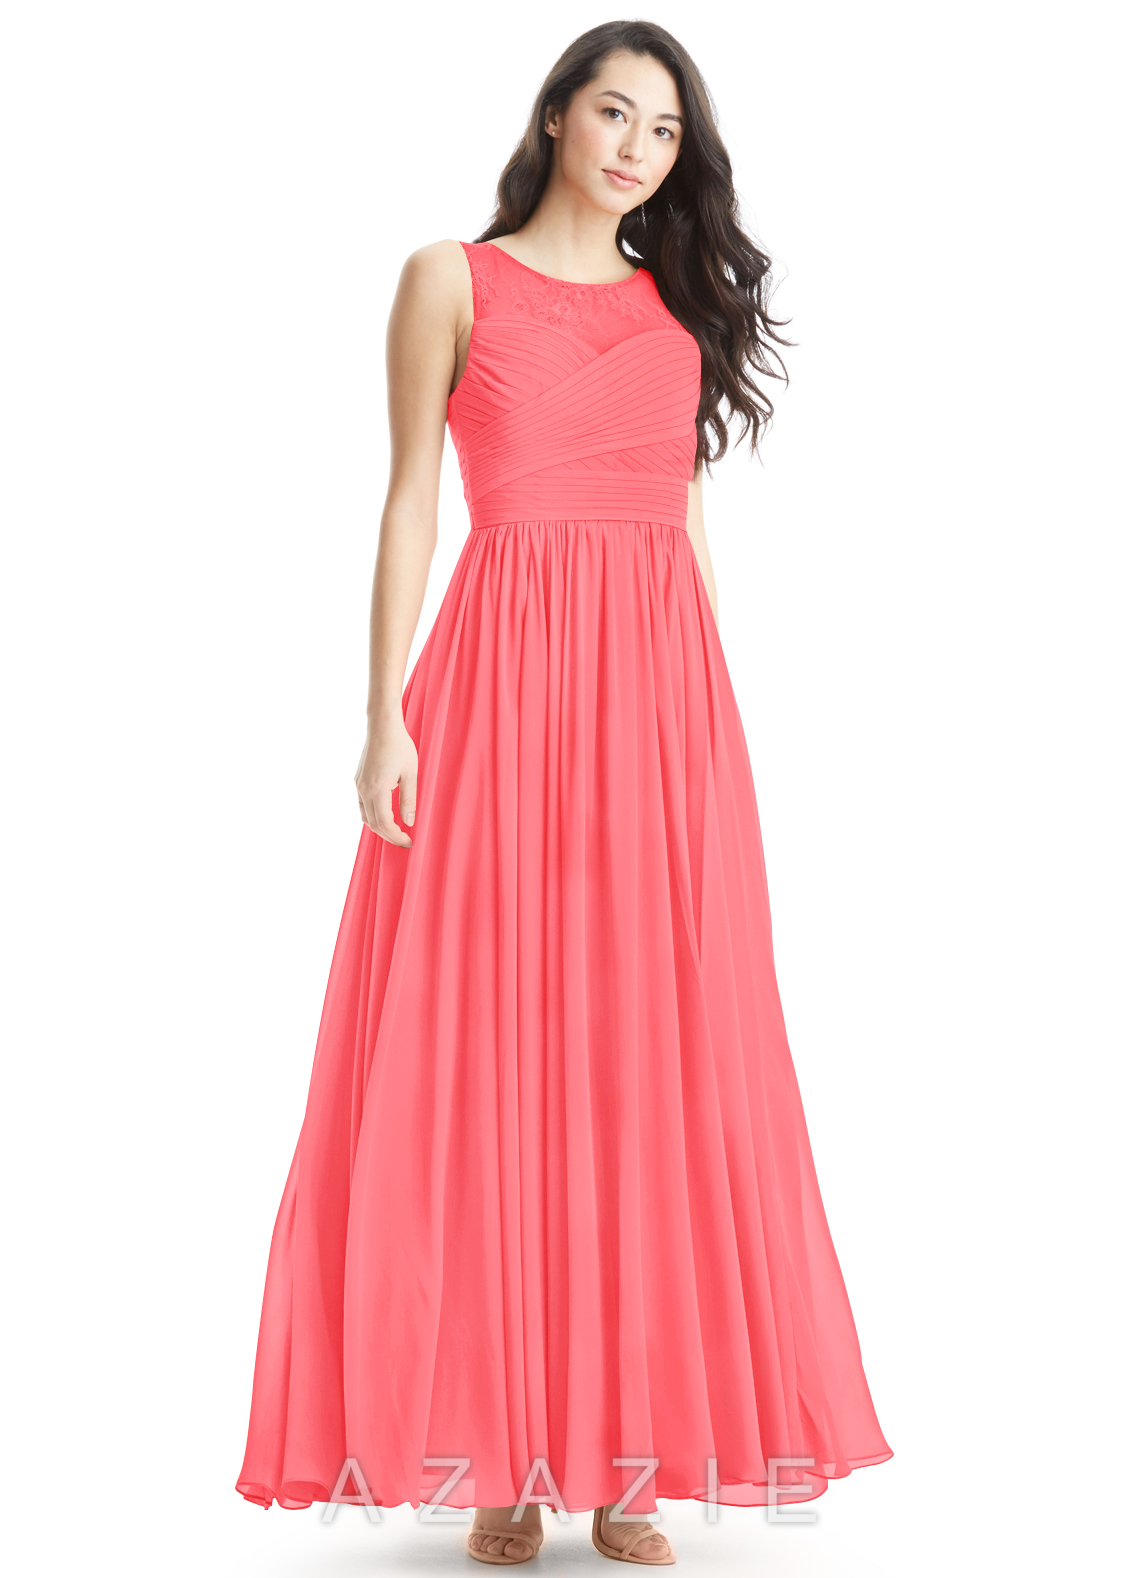 Azazie aliya bridesmaid dress azazie color watermelon ombrellifo Image collections